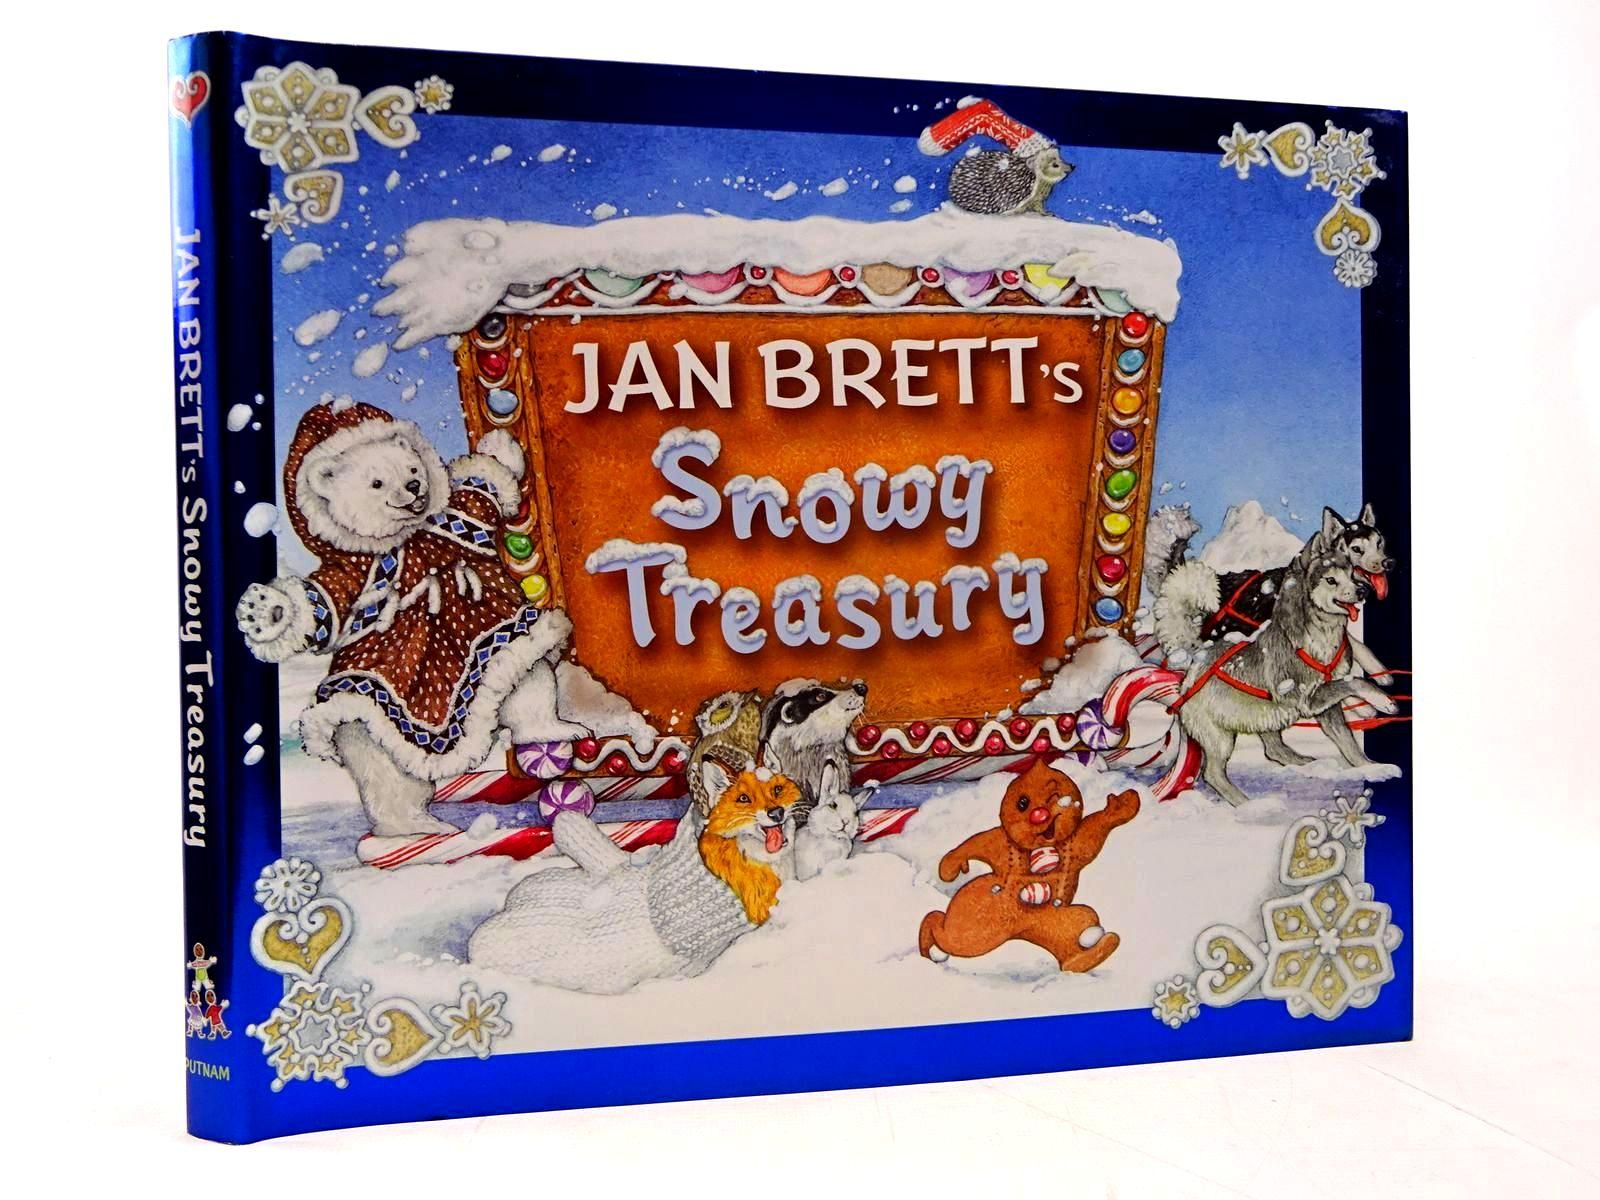 Photo of JAN BRETT'S SNOWY TREASURY written by Brett, Jan illustrated by Brett, Jan published by G.P. Putnam's Sons (STOCK CODE: 2130705)  for sale by Stella & Rose's Books